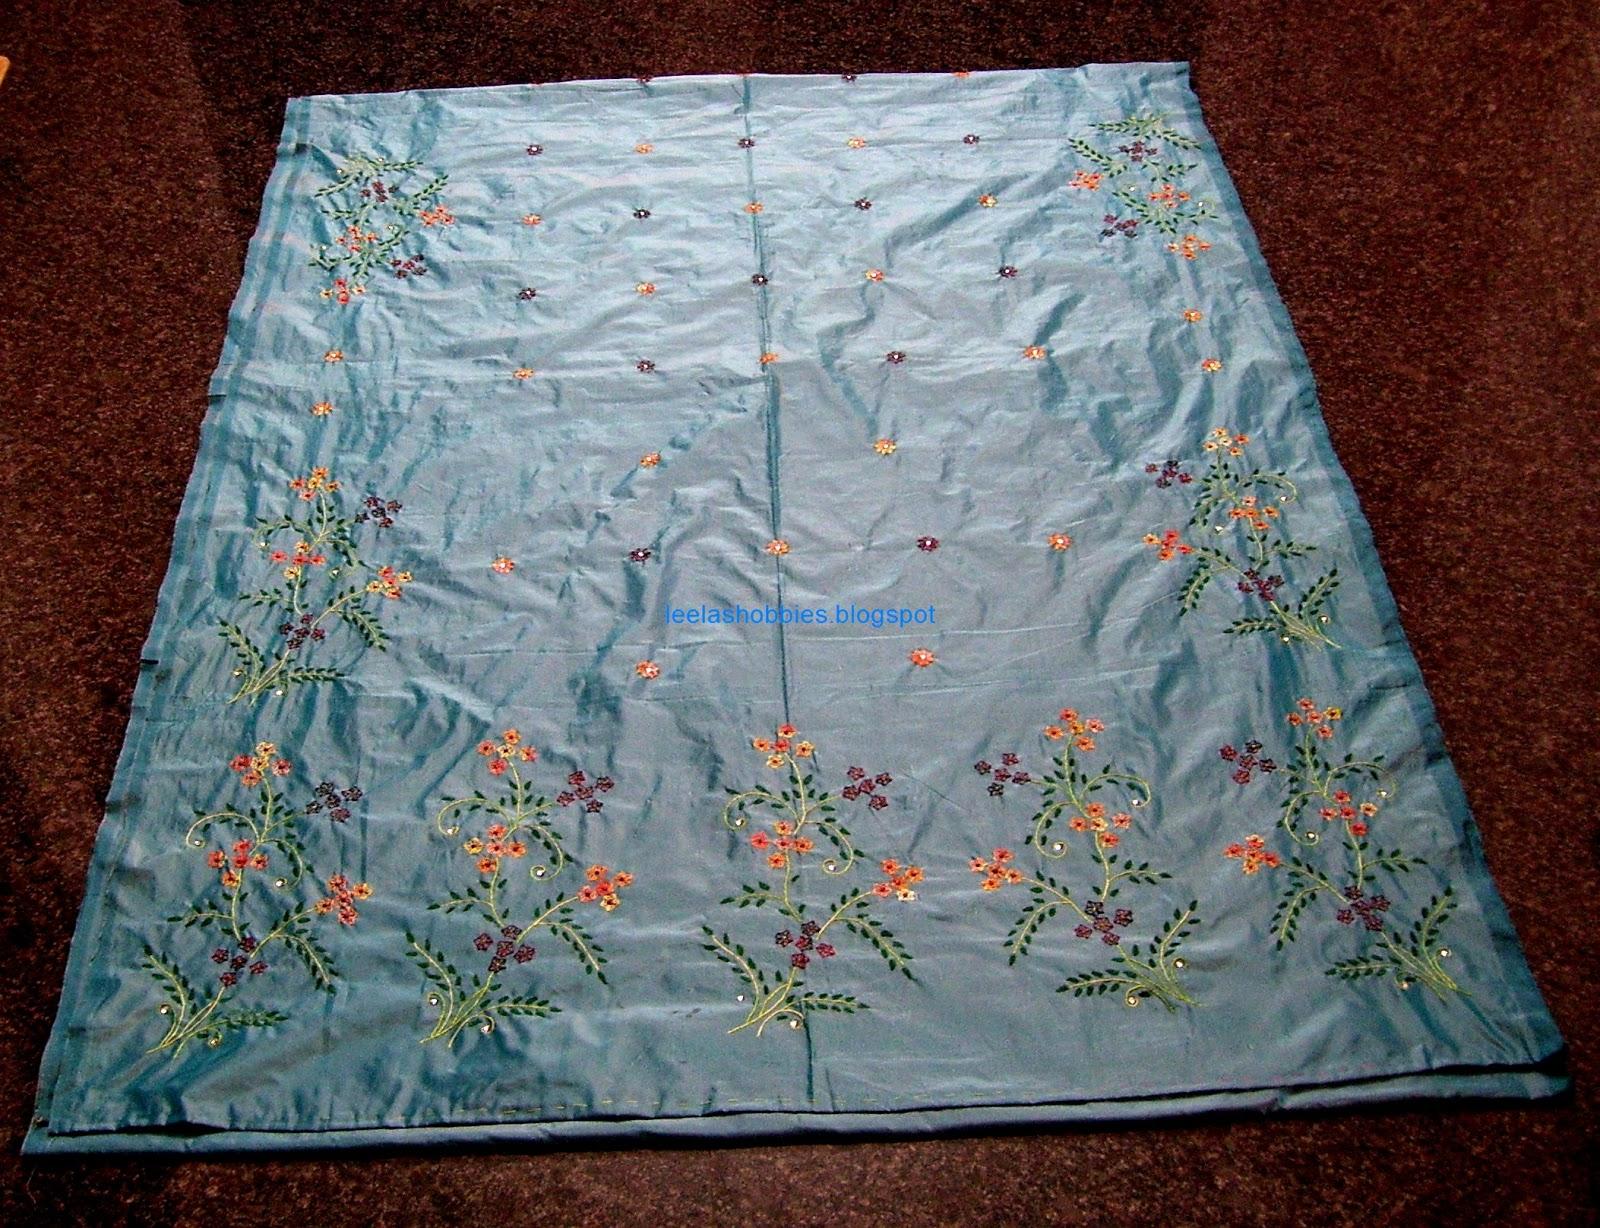 Leelas Hobbies Hand Embroidery Saree